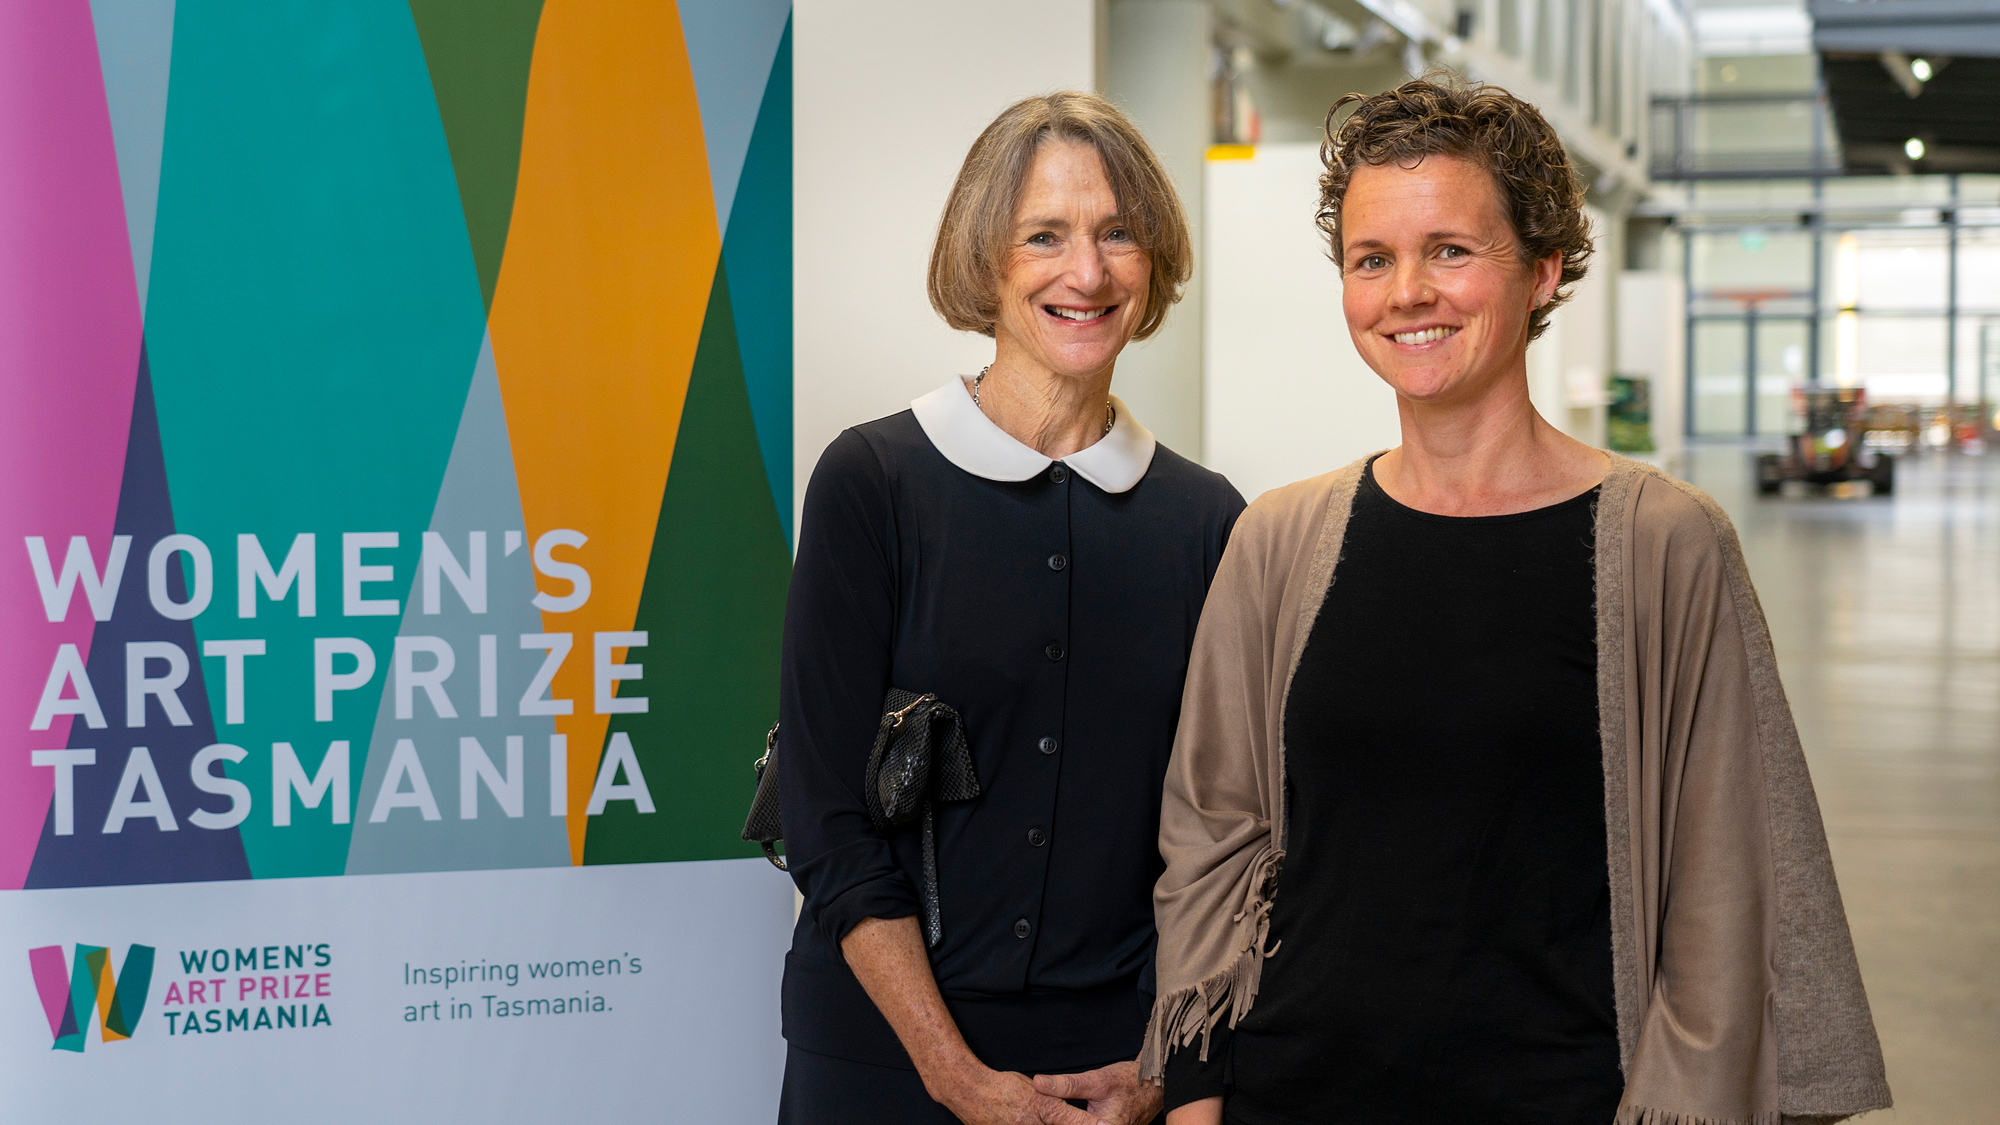 women's-art-prize-tasmania.jpg